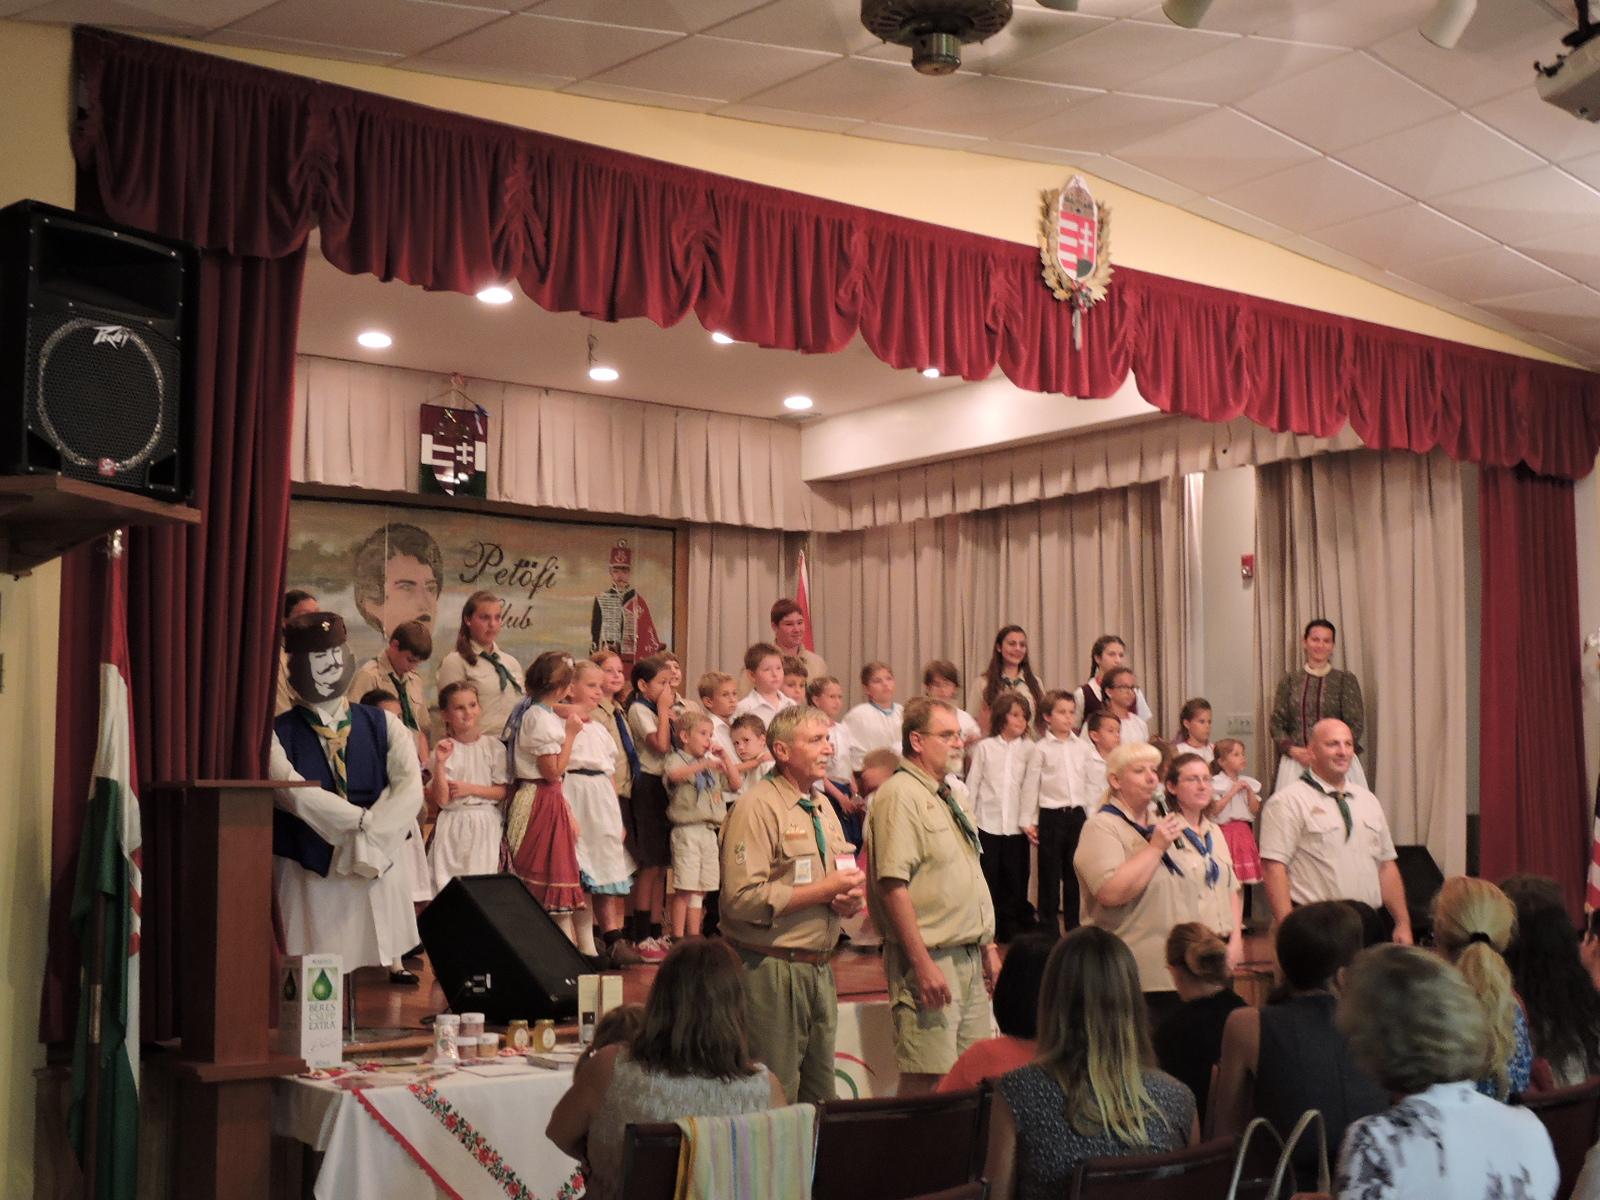 Parade of Hungarian culture at HATOG IX